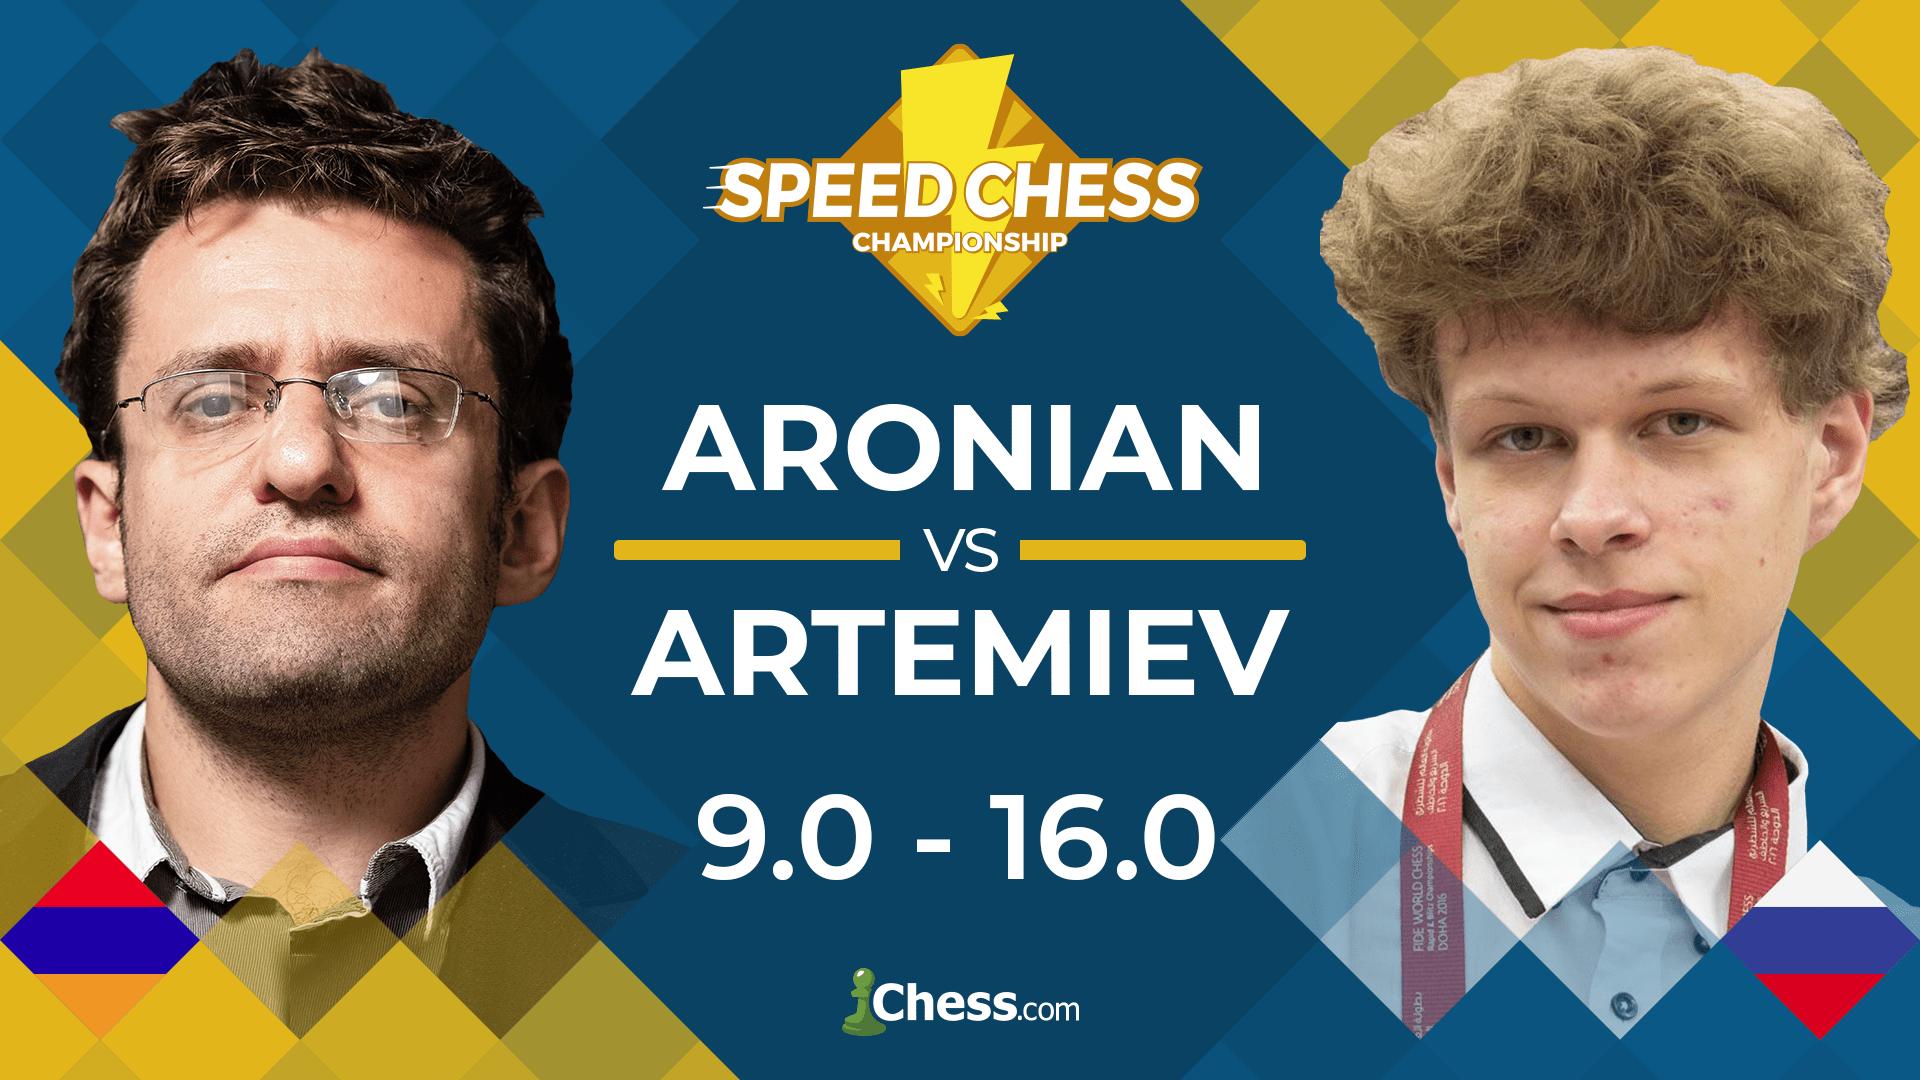 Artemiev Beats Aronian In Speed Chess Quarterfinals - Chess.com